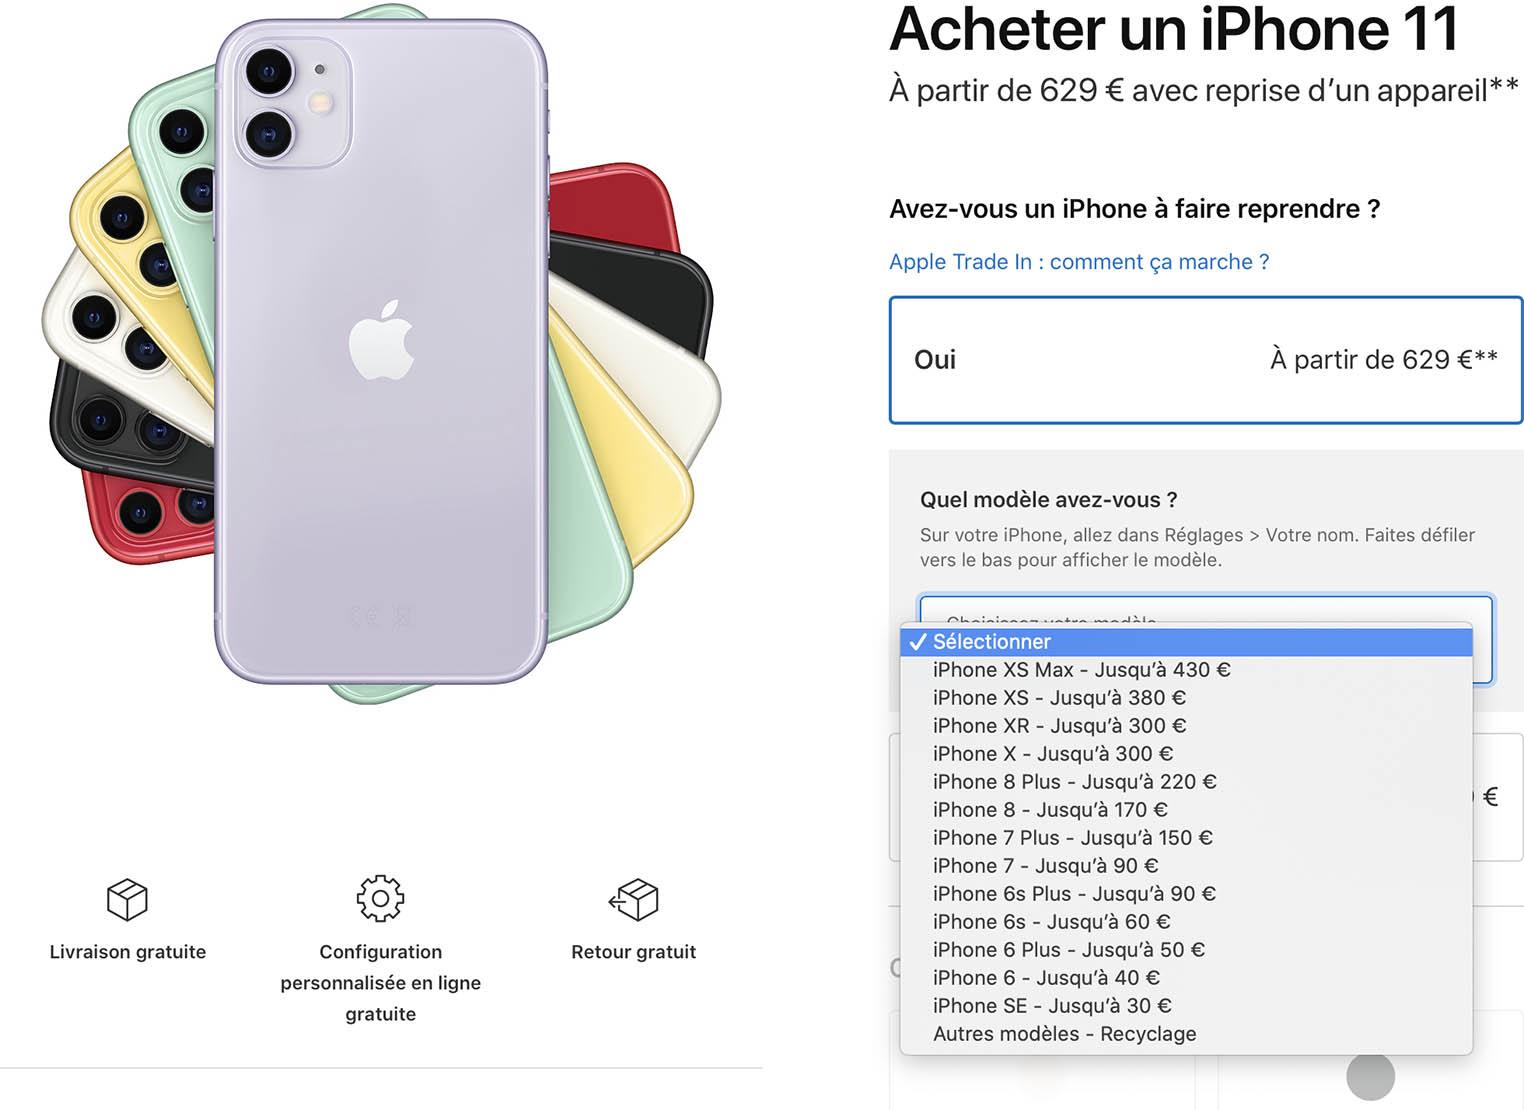 Tarifs reprise iPhone janvier 2020